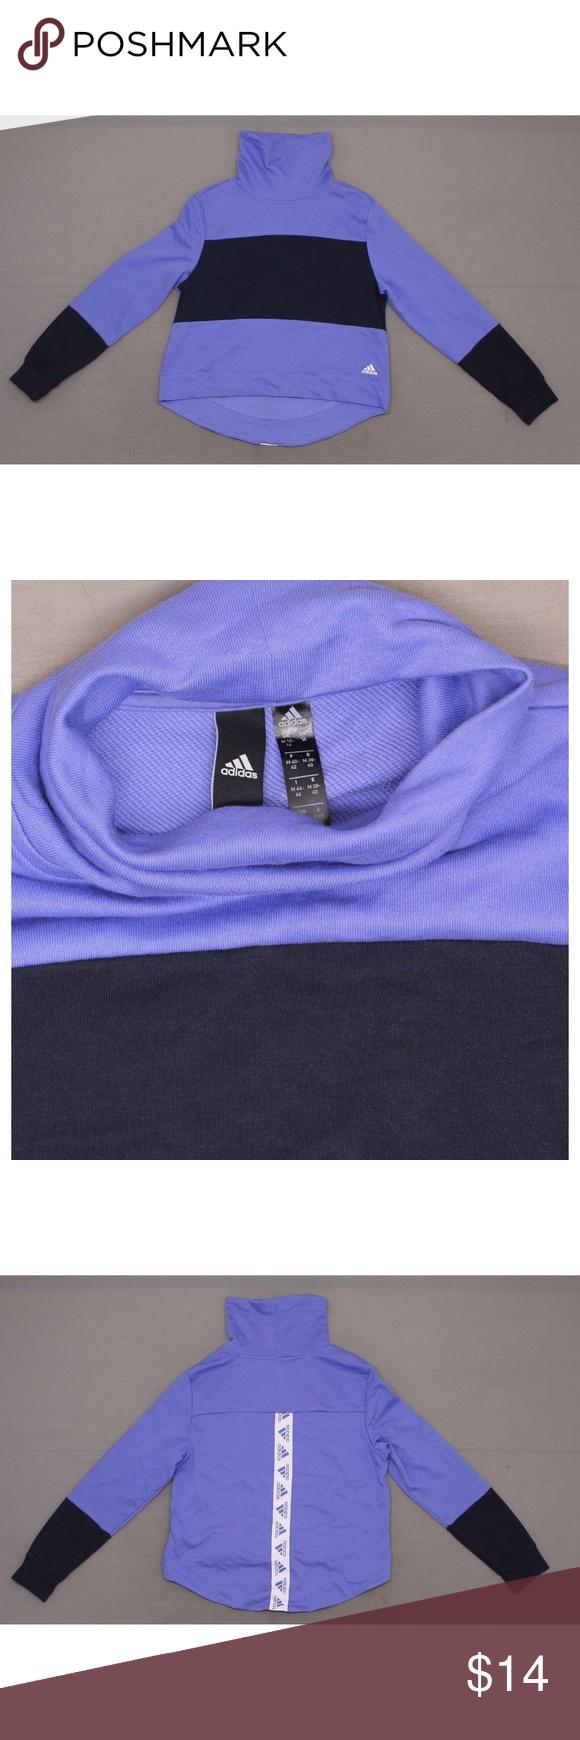 Adidas Sport 2 Street Cowl Neck Sweatshirt Medium Cowl Neck Sweatshirt Adidas Sport Adidas Women [ 1740 x 580 Pixel ]